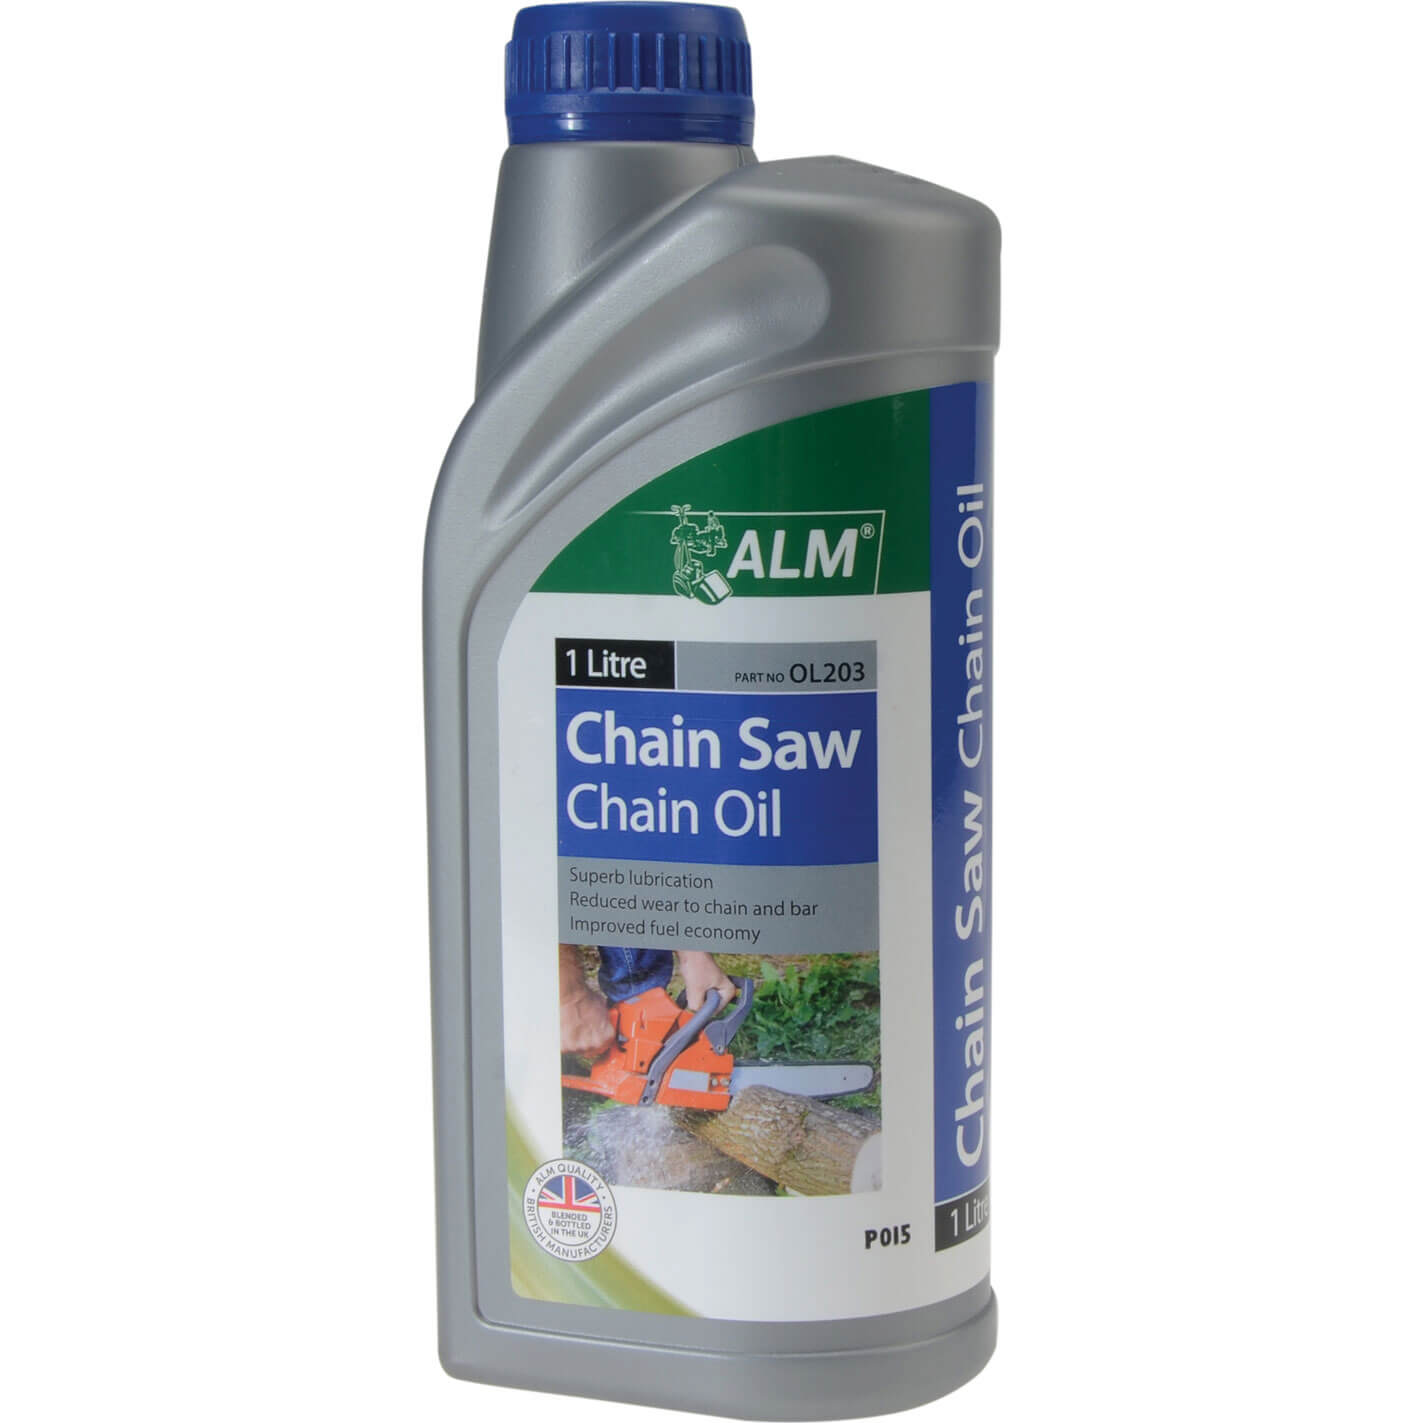 Image of ALM Chainsaw Chain Oil 1l